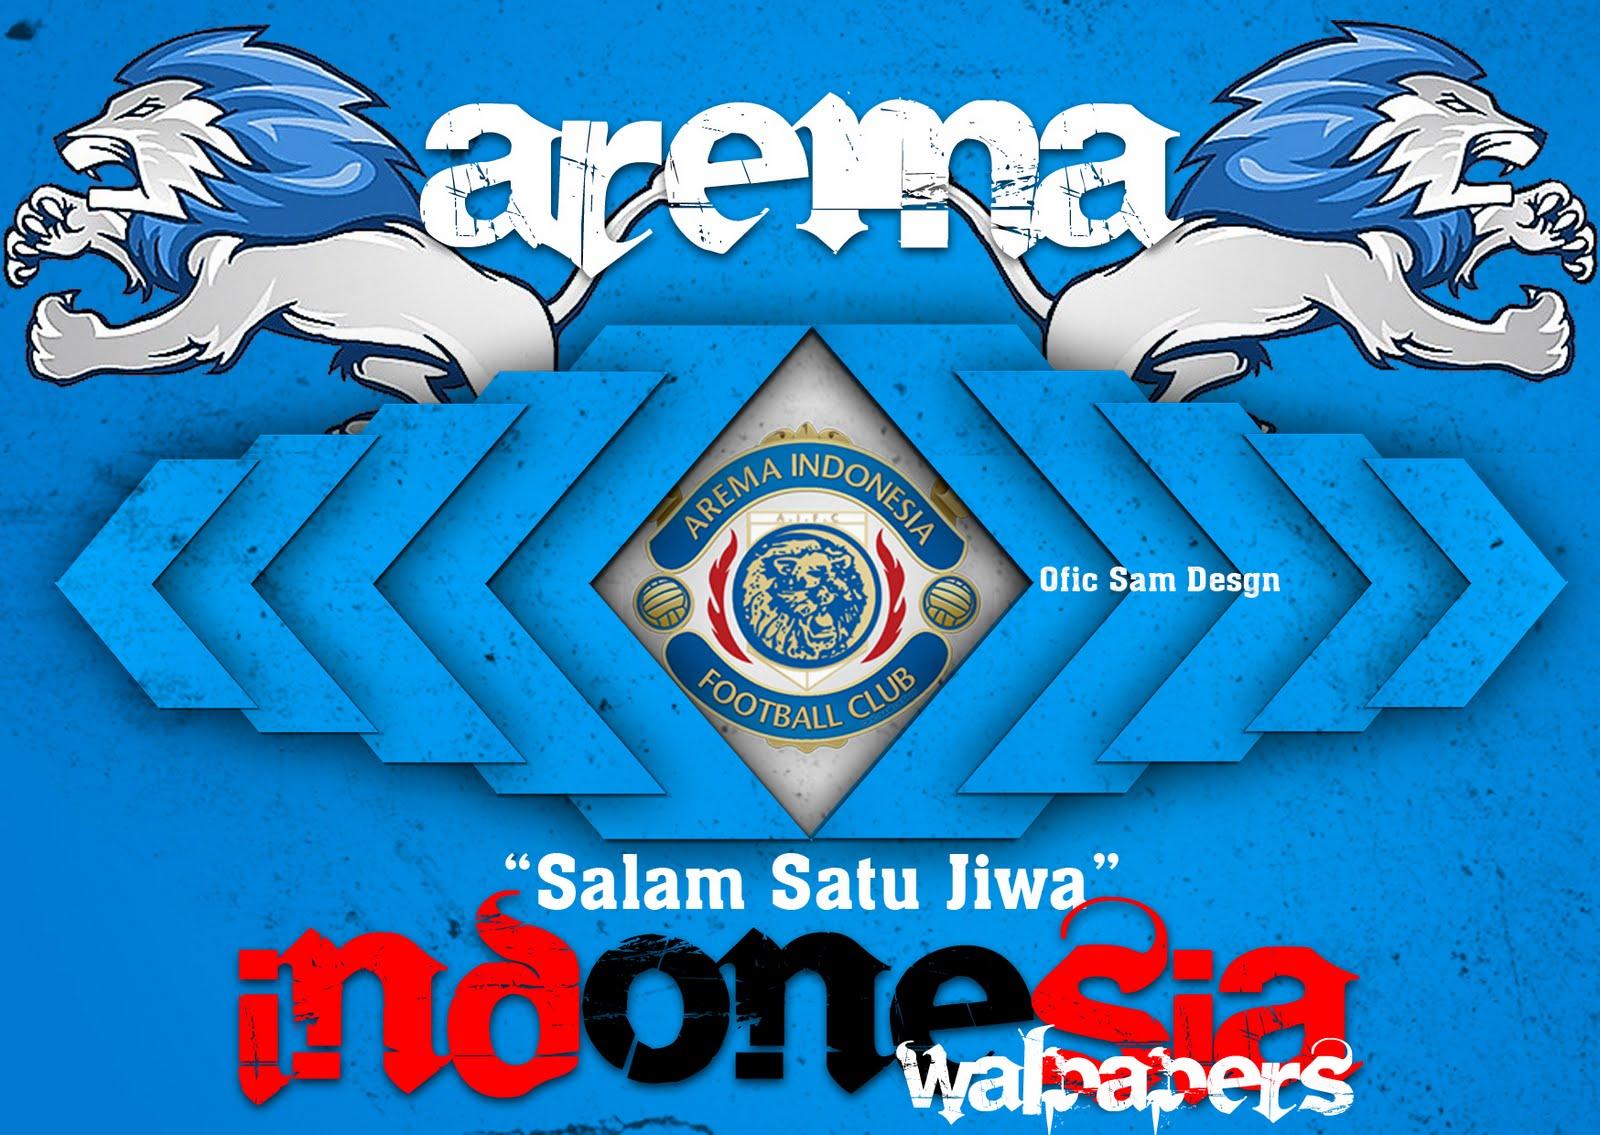 http://2.bp.blogspot.com/-Pnh9qwb-3h0/TmwiPp6UjaI/AAAAAAAAAl4/4sK1FKAX49M/s1600/Ofic+sam+design+-+partner+AREMA+INDONESIA+wallpapers+-+logo+arema.jpg